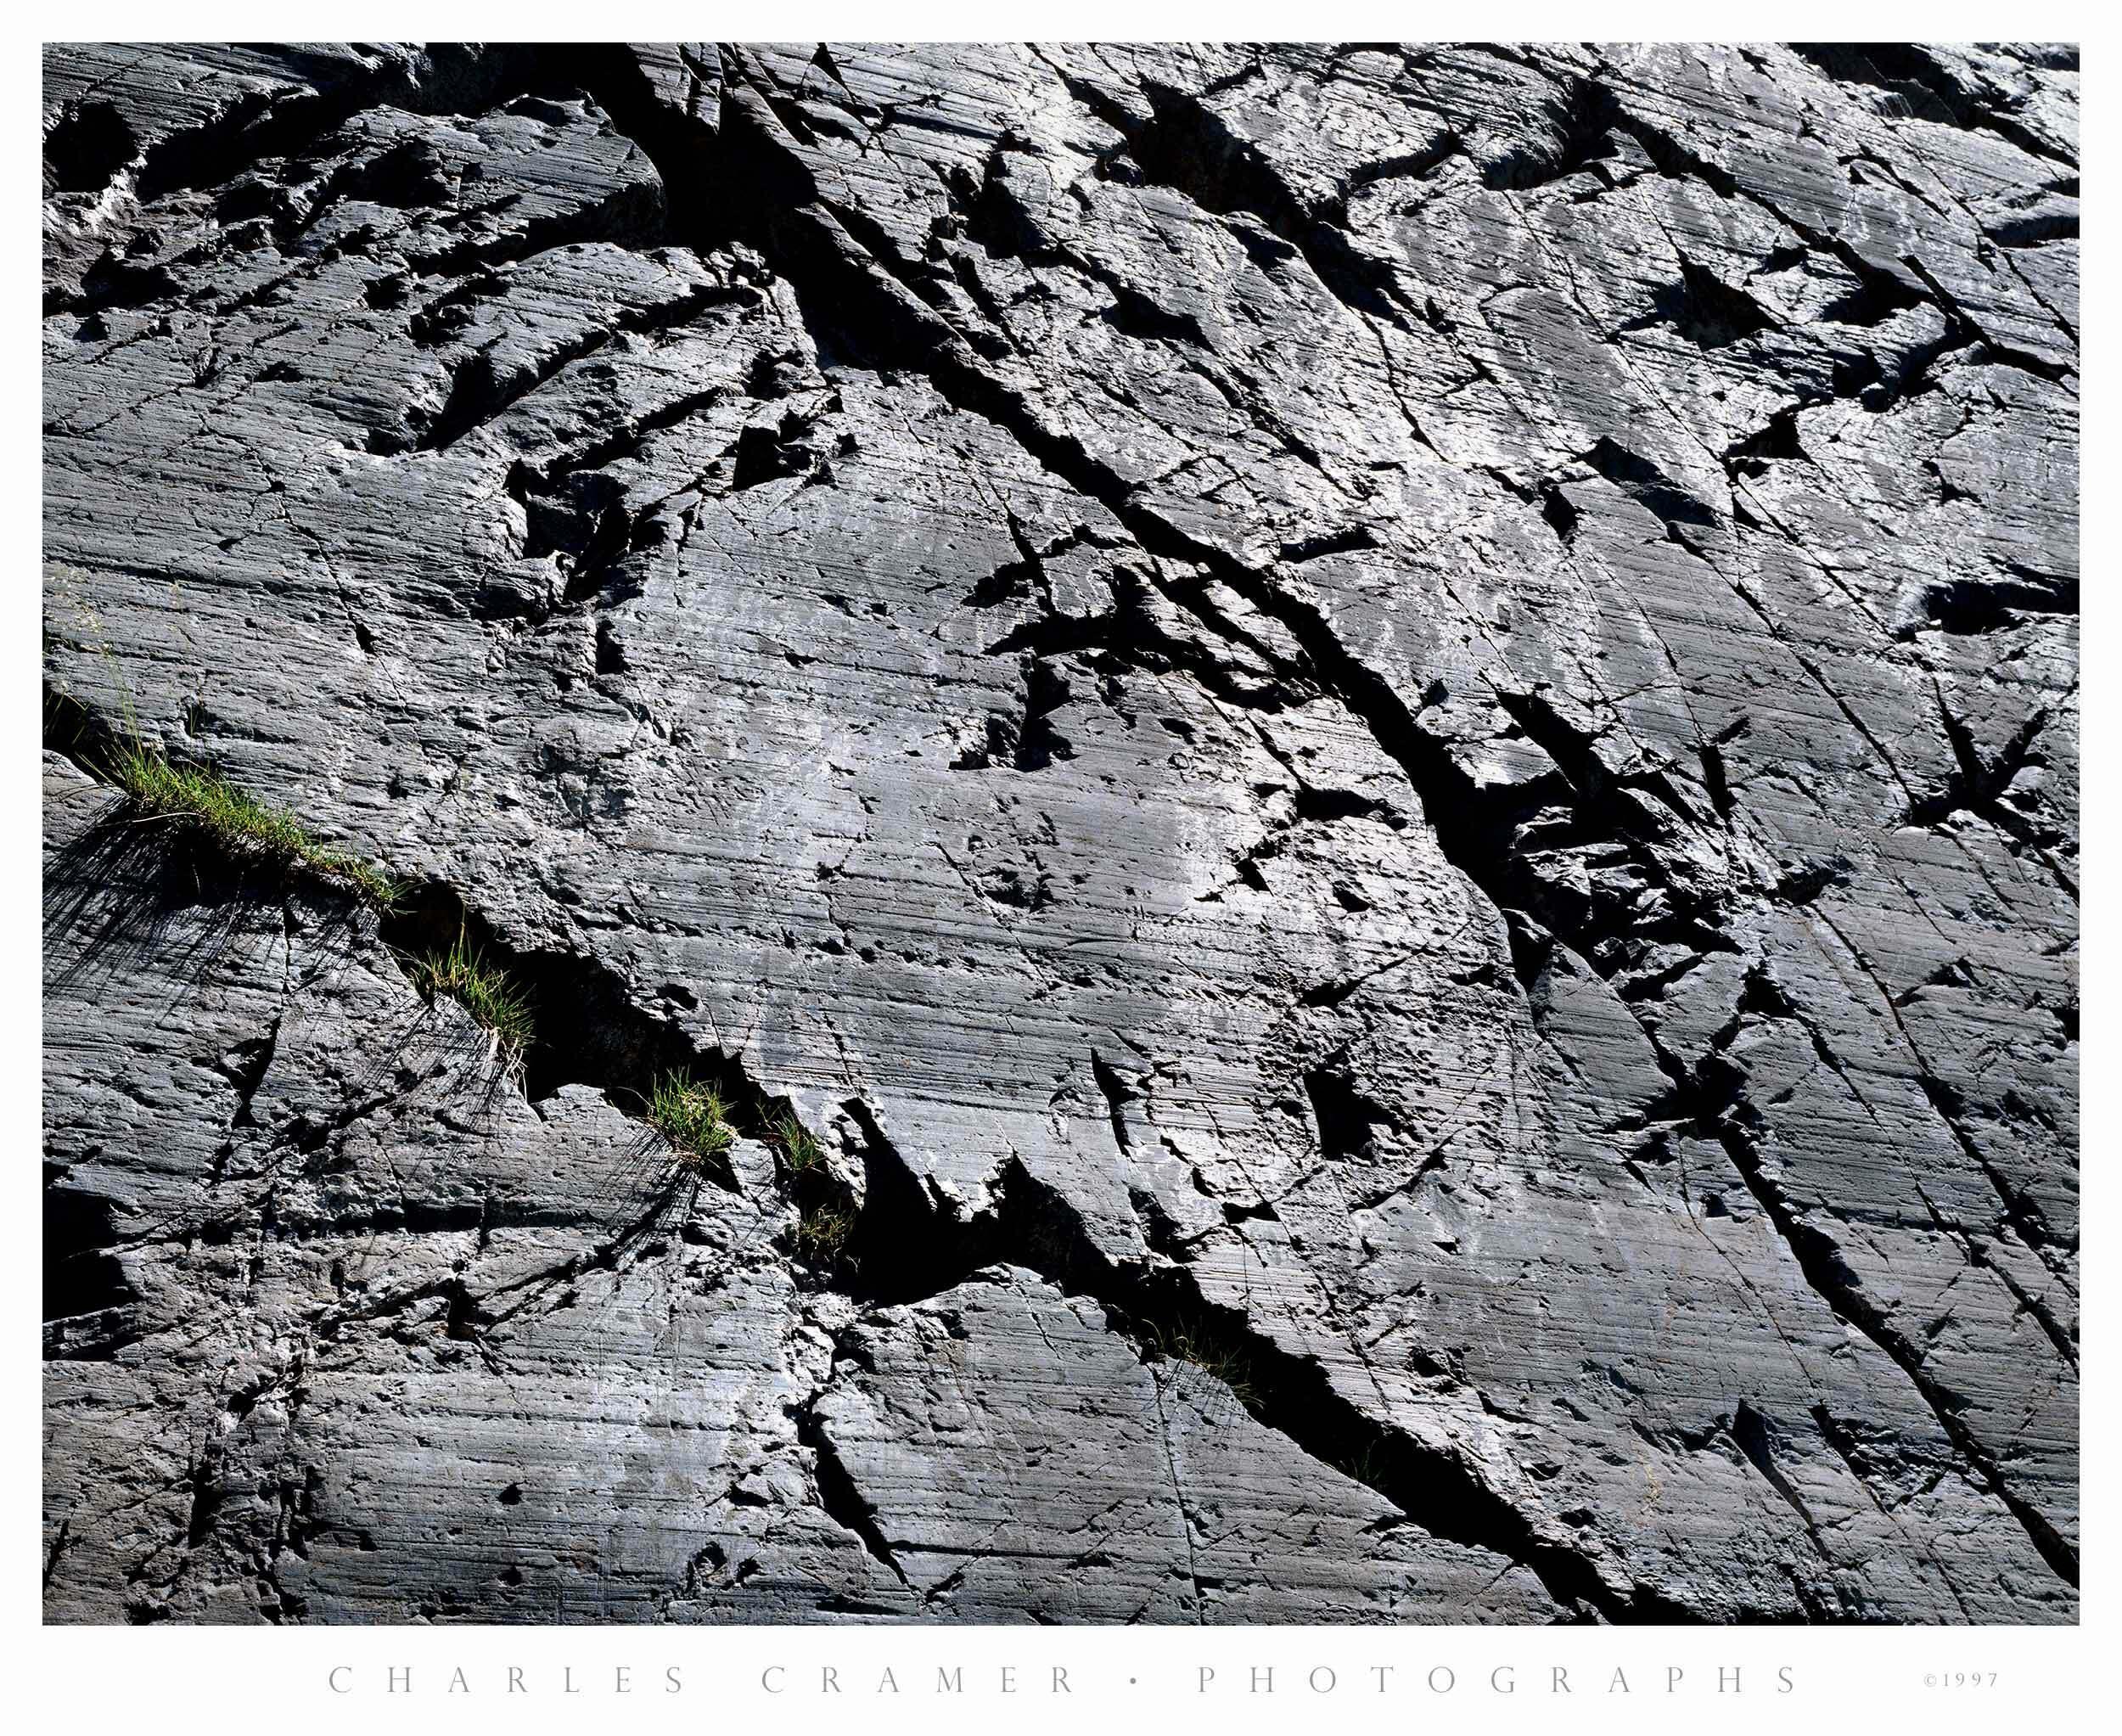 Granite Wall and Grasses,  Ediza Lake